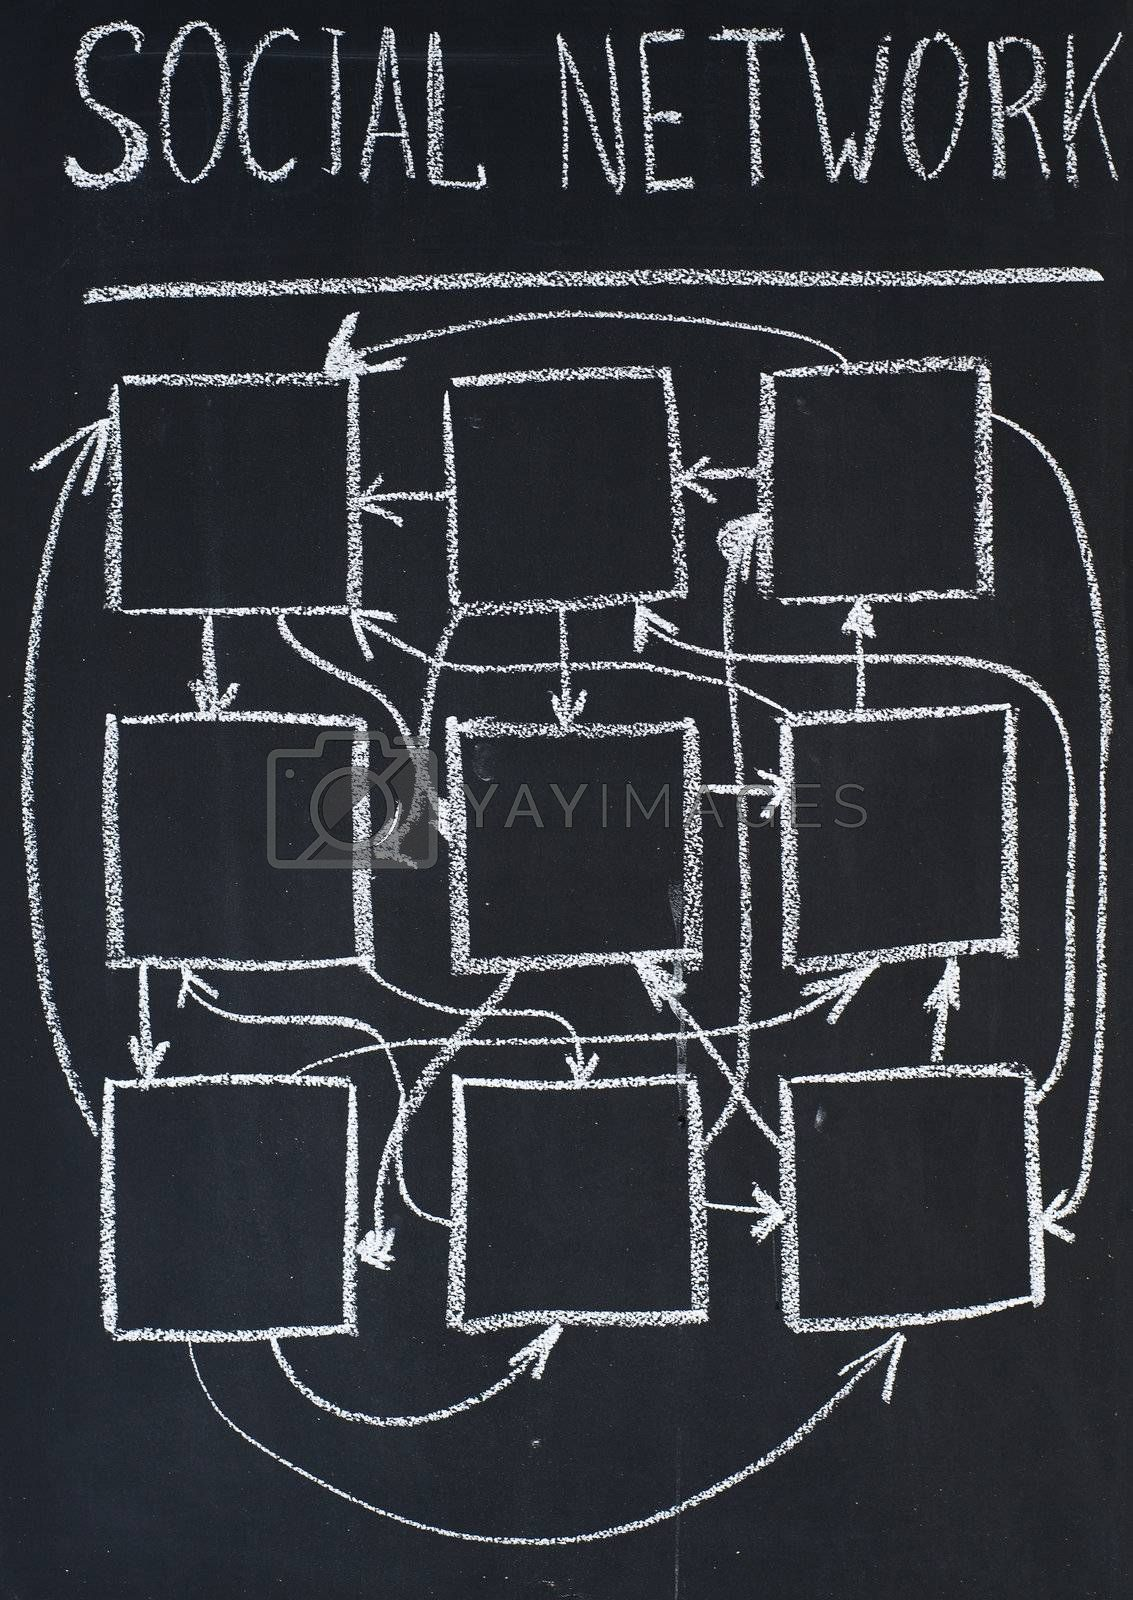 Scheme of social network drawn on a blackboard